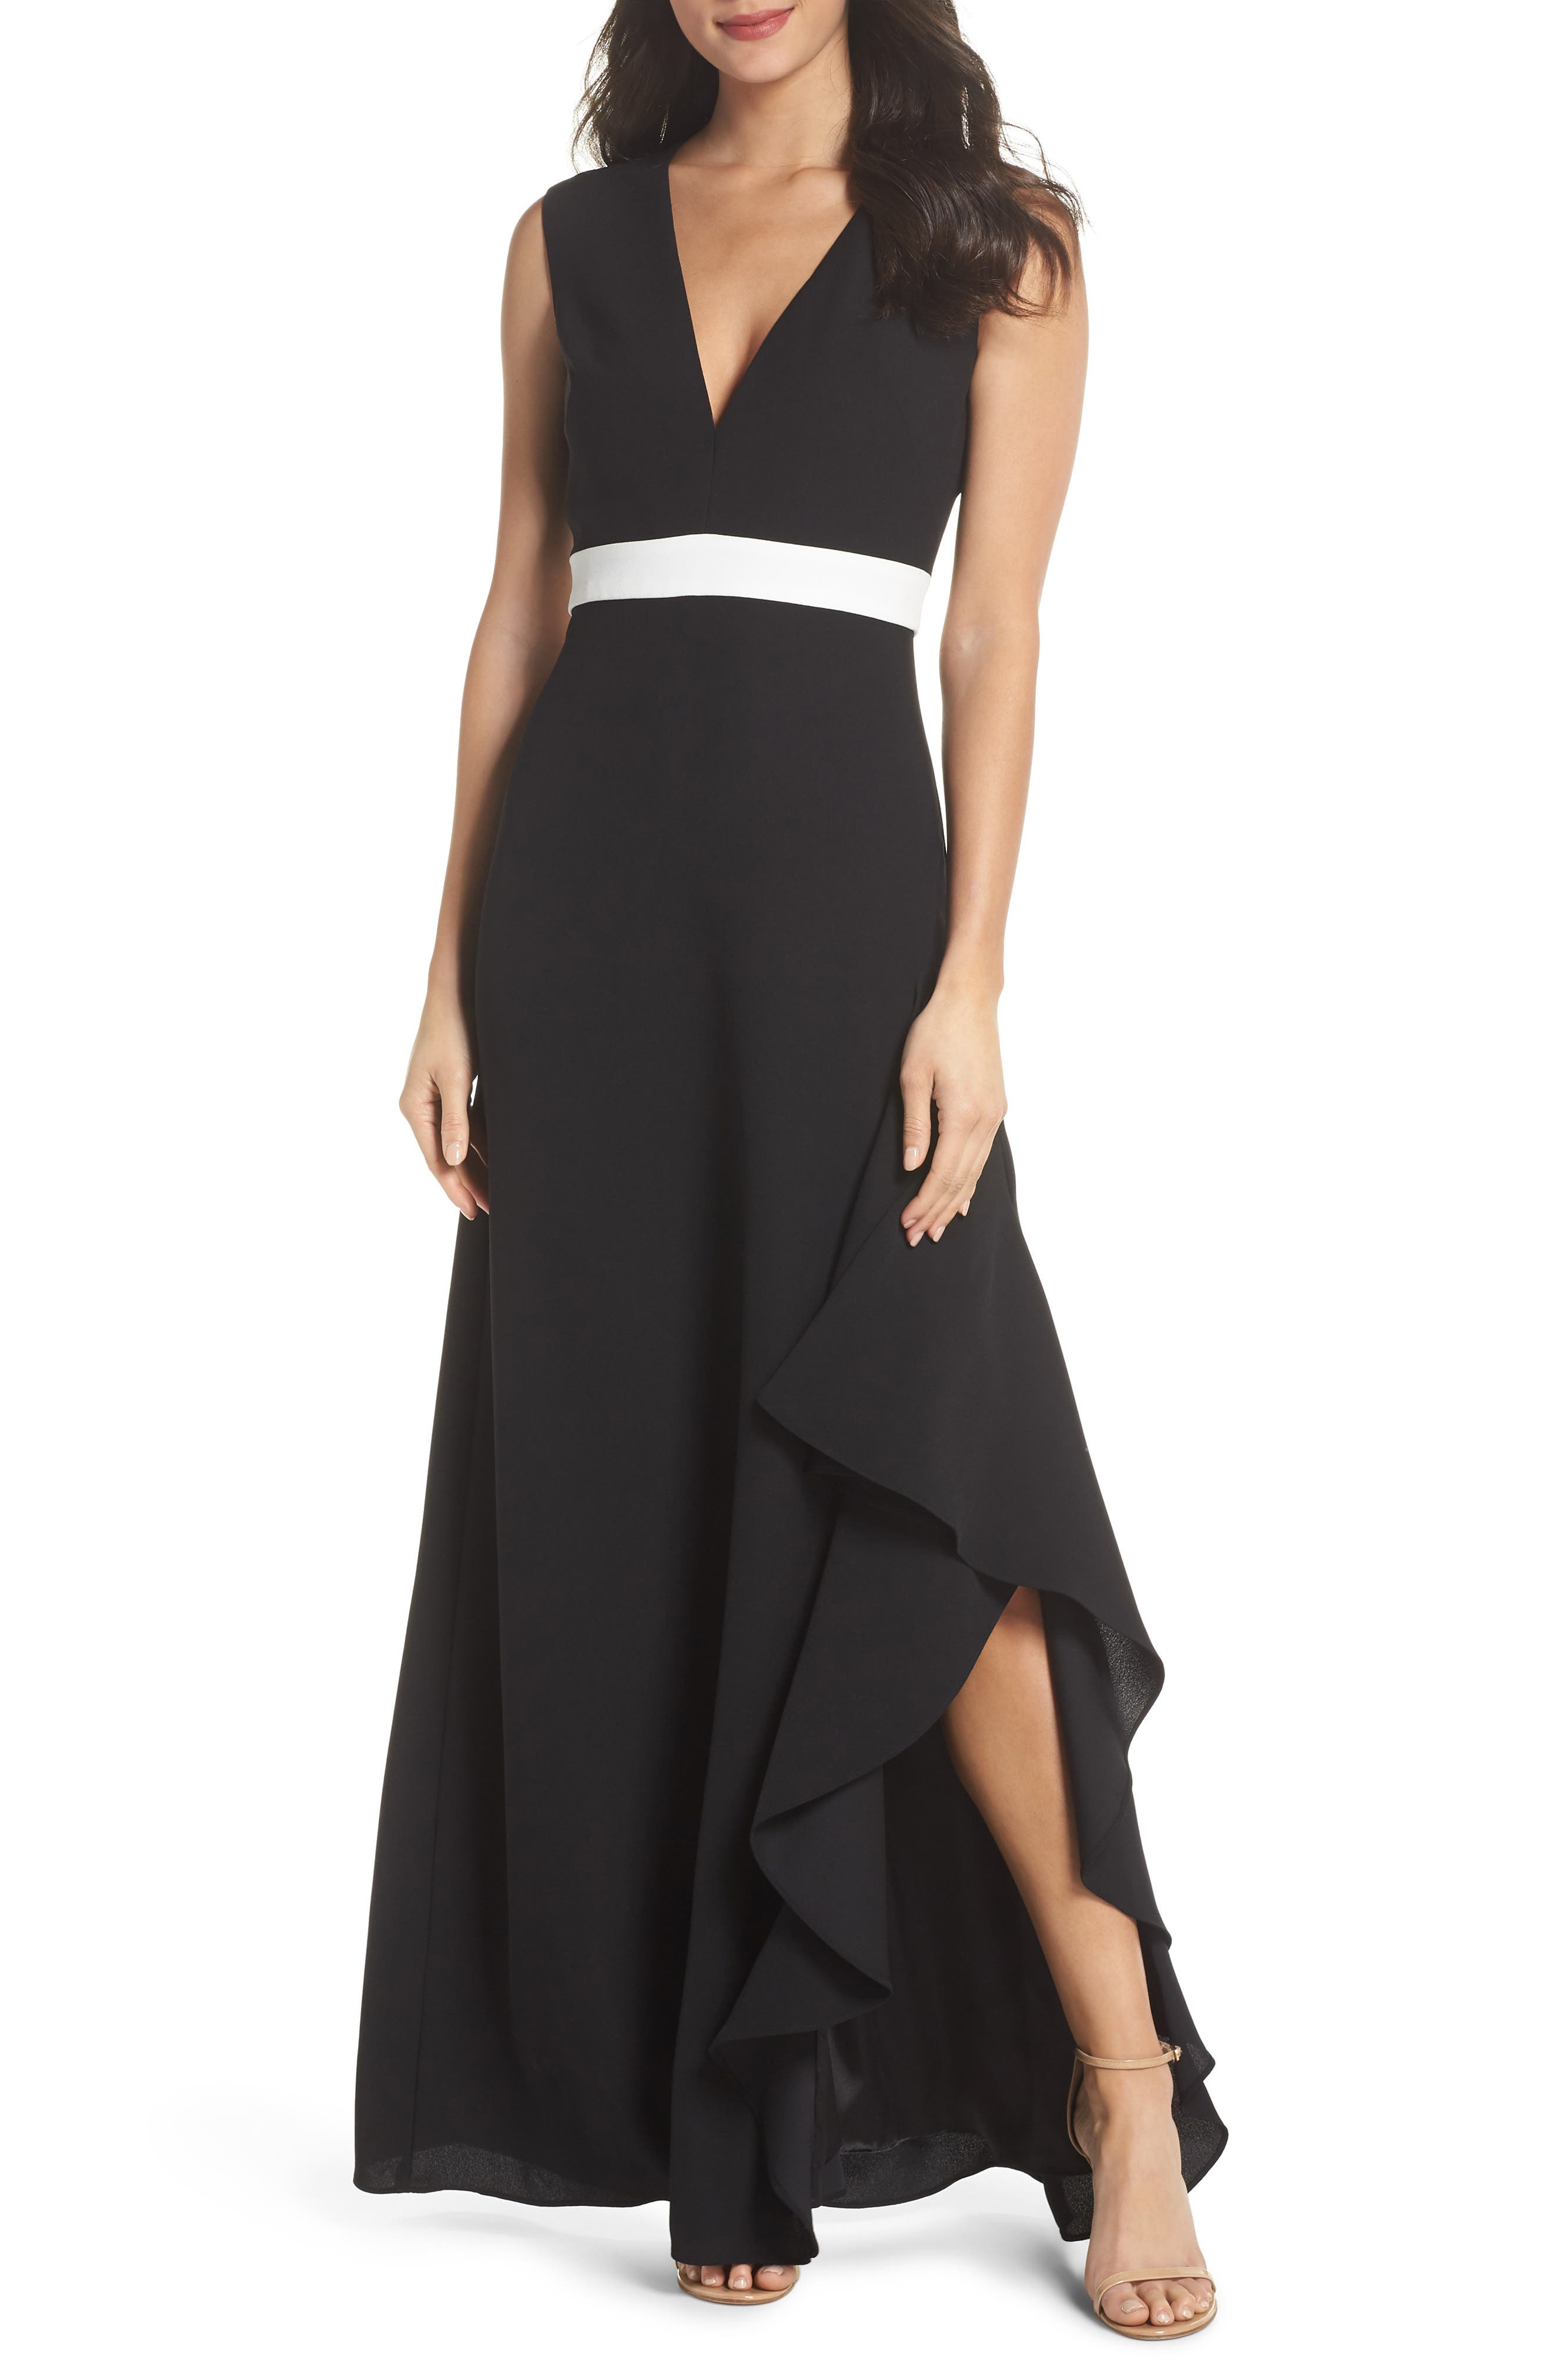 ML Monique Lhullier Sleeveless Crepe Gown,                             Main thumbnail 1, color,                             Black/ White